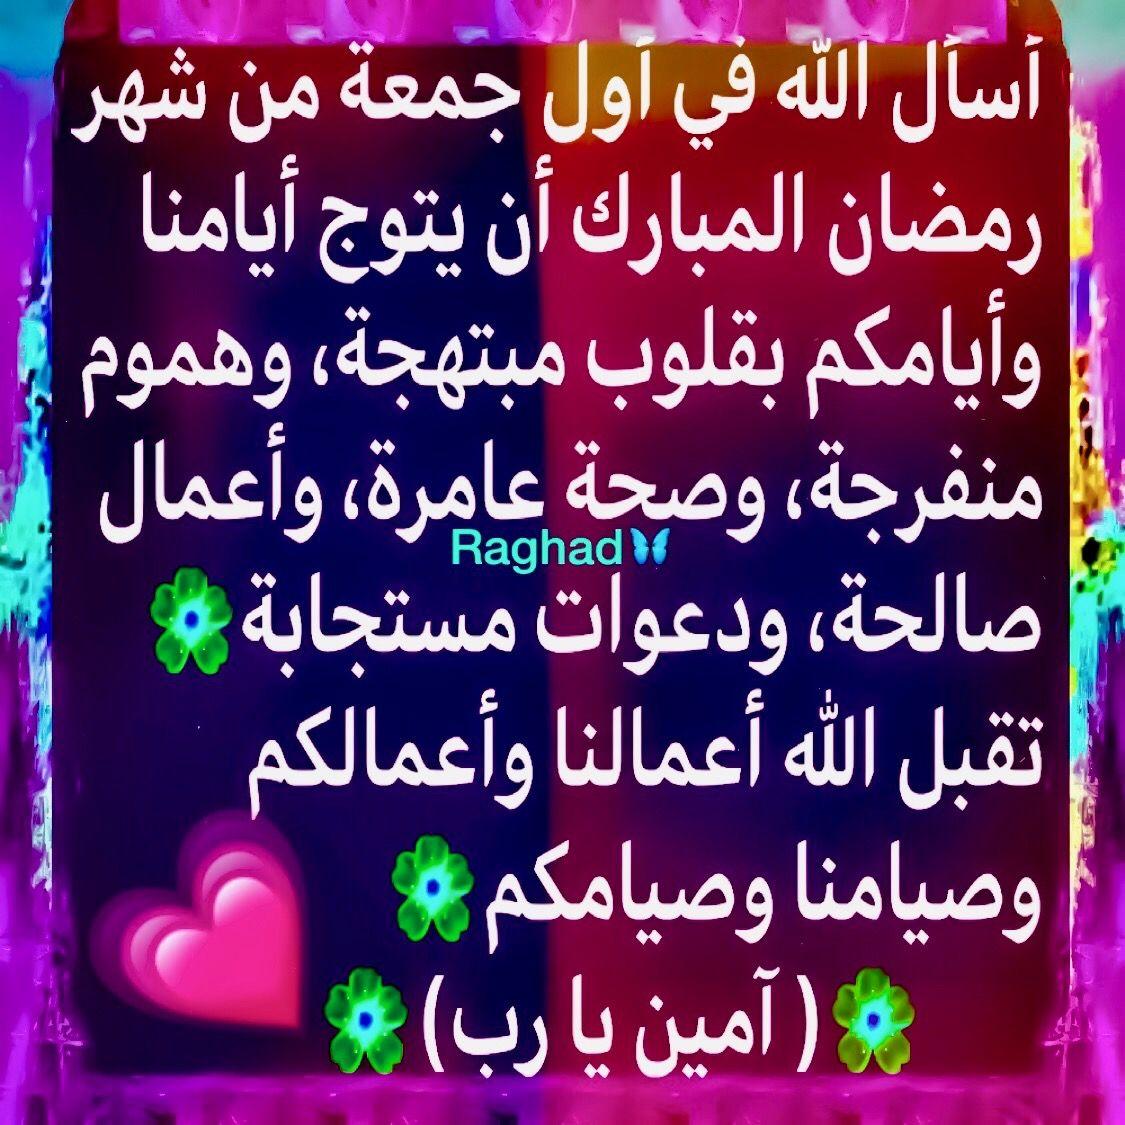 Desertrose أسأل الله في أول جمعة من شهر رمضان المبارك أن يتوج أيامنا وأيامكم بقلوب مبتهجة وهموم منفرجة وصحة عامرة وأع Ramadan Kareem Neon Signs Ramadan